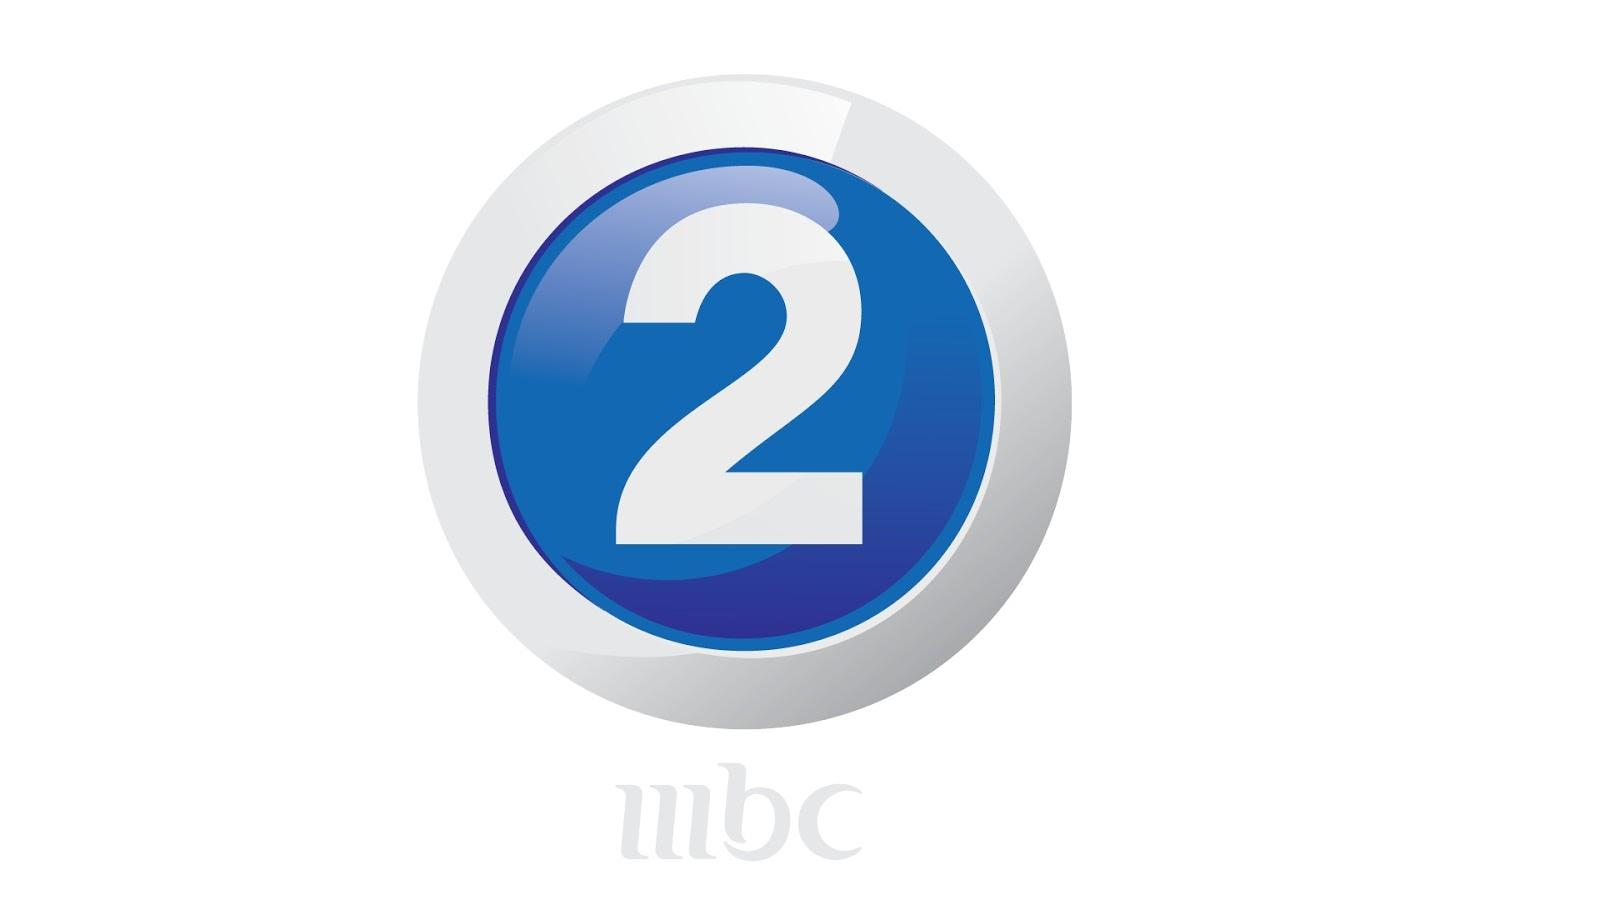 Mbc 1234maxaction New Frequencies On Nilesat Badr